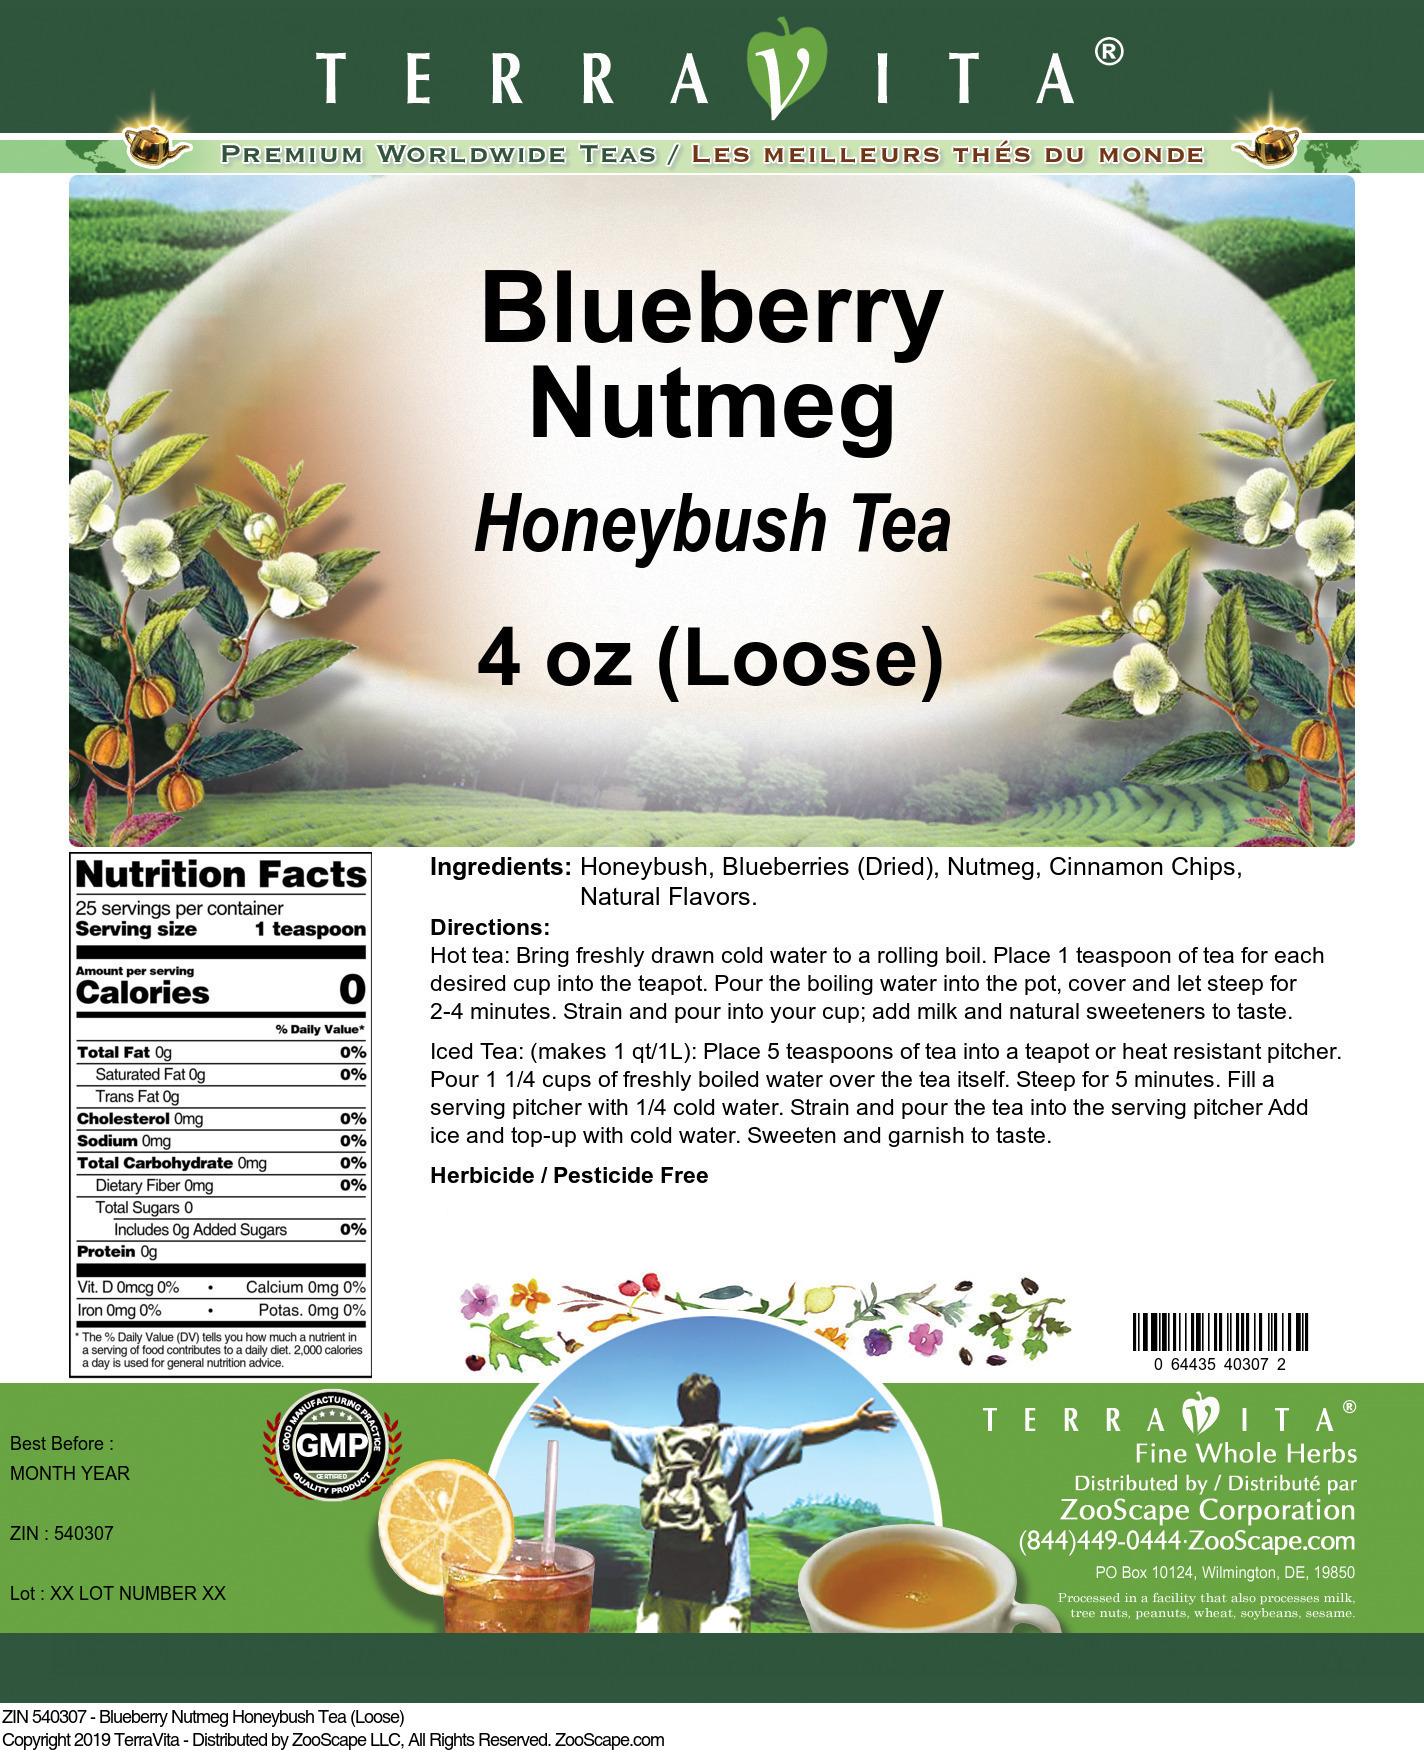 Blueberry Nutmeg Honeybush Tea